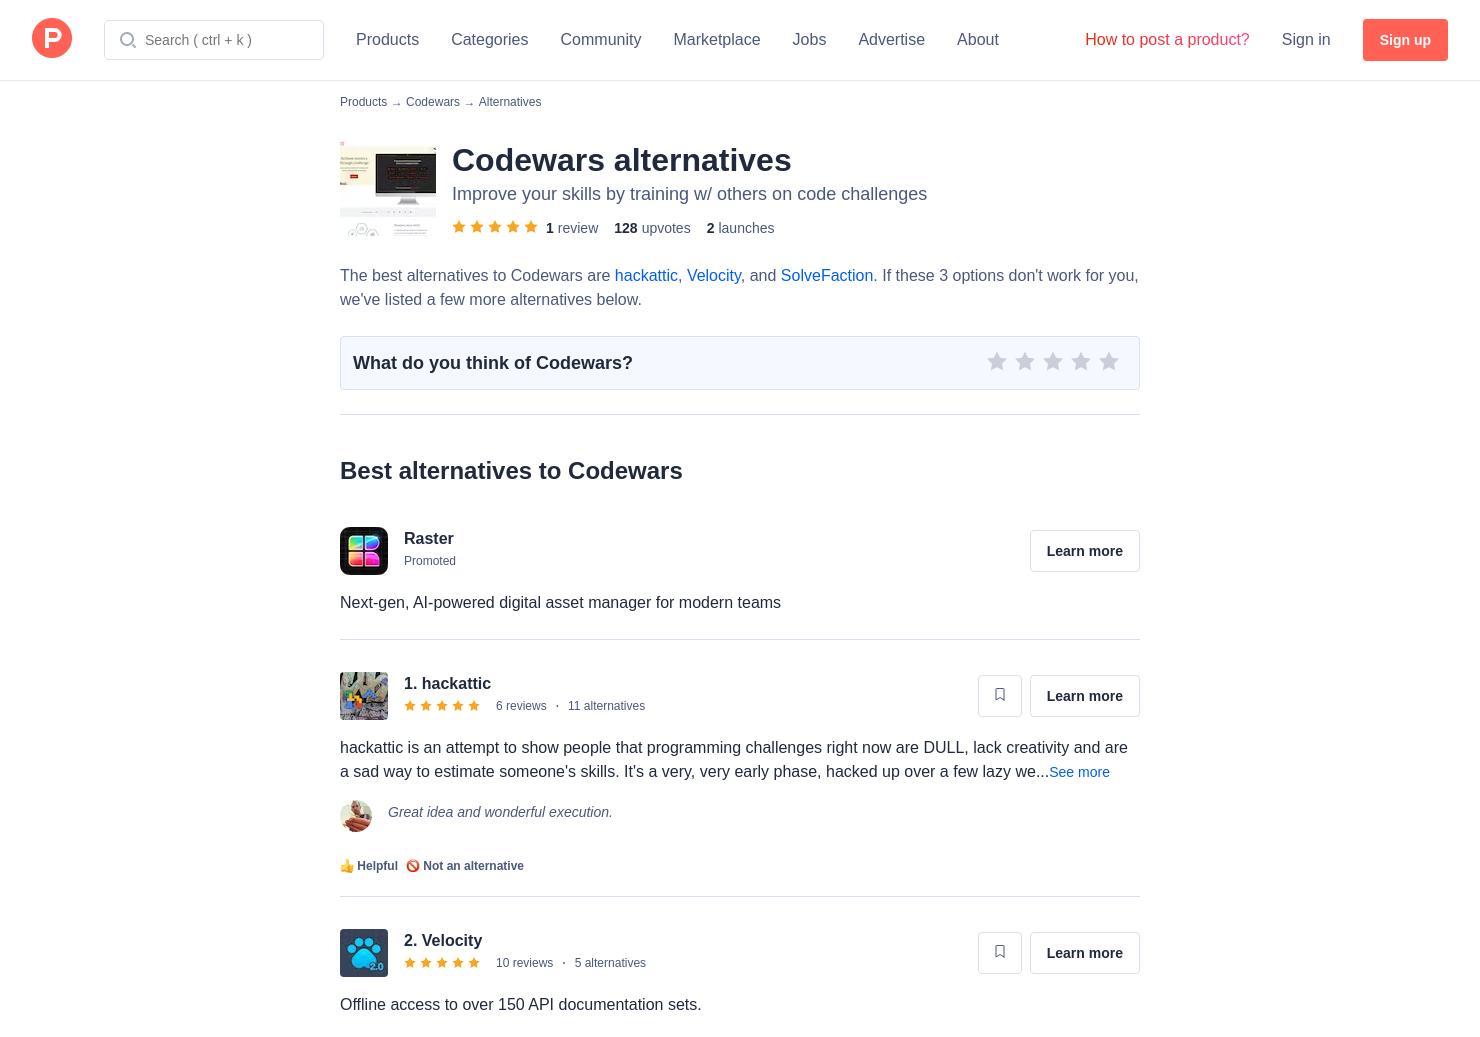 7 Alternatives to Codewars | Product Hunt